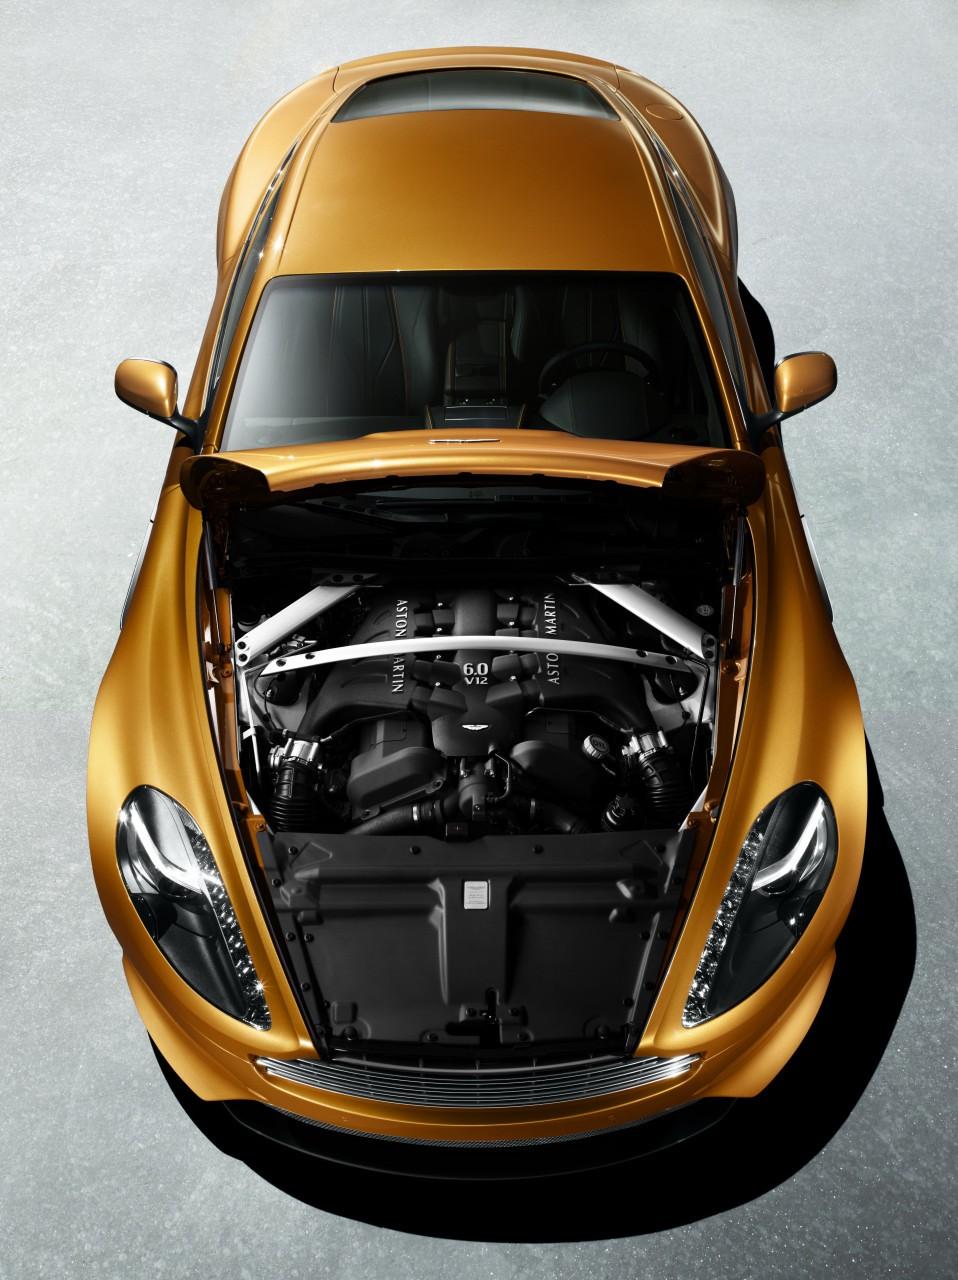 2012 ASTON MARTIN VIRAGE COUPE ENGINE SPECS